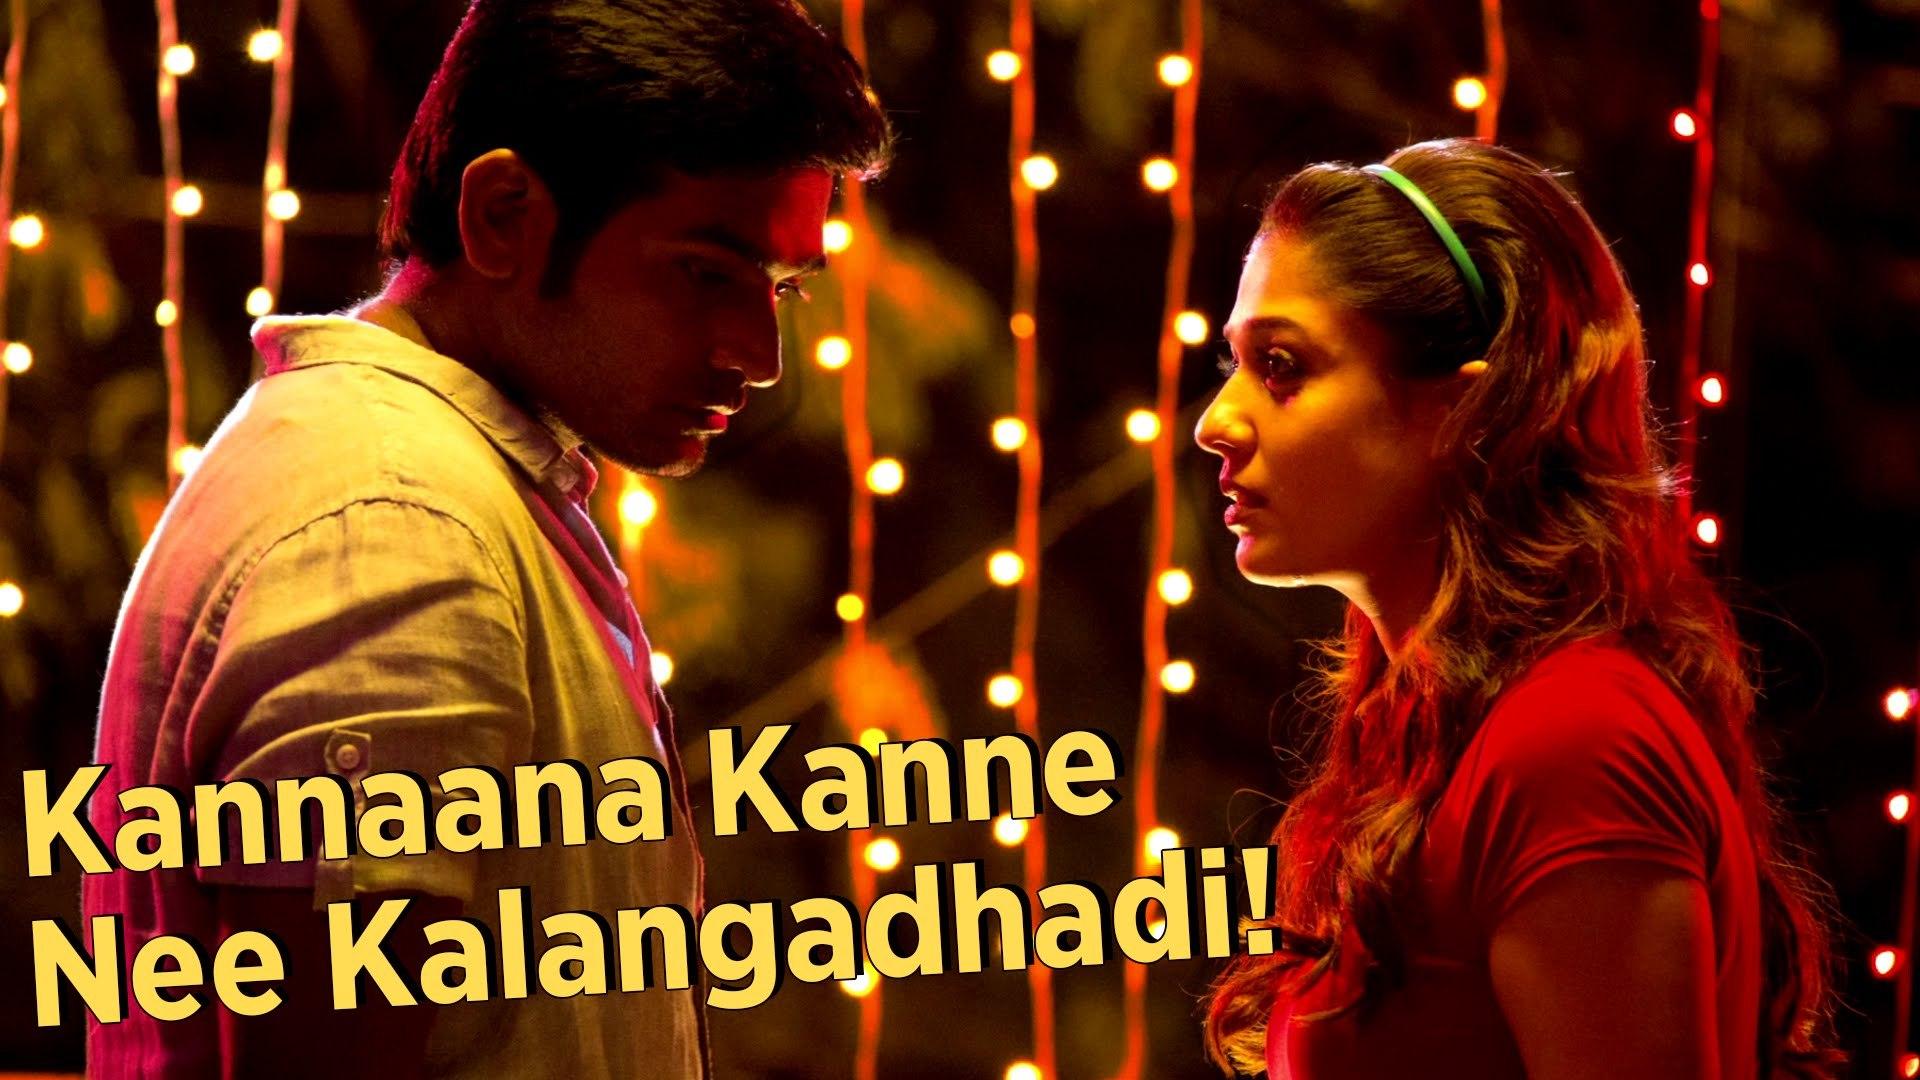 Kanna Moodi Kanda Kanavu Mp3 Song Download